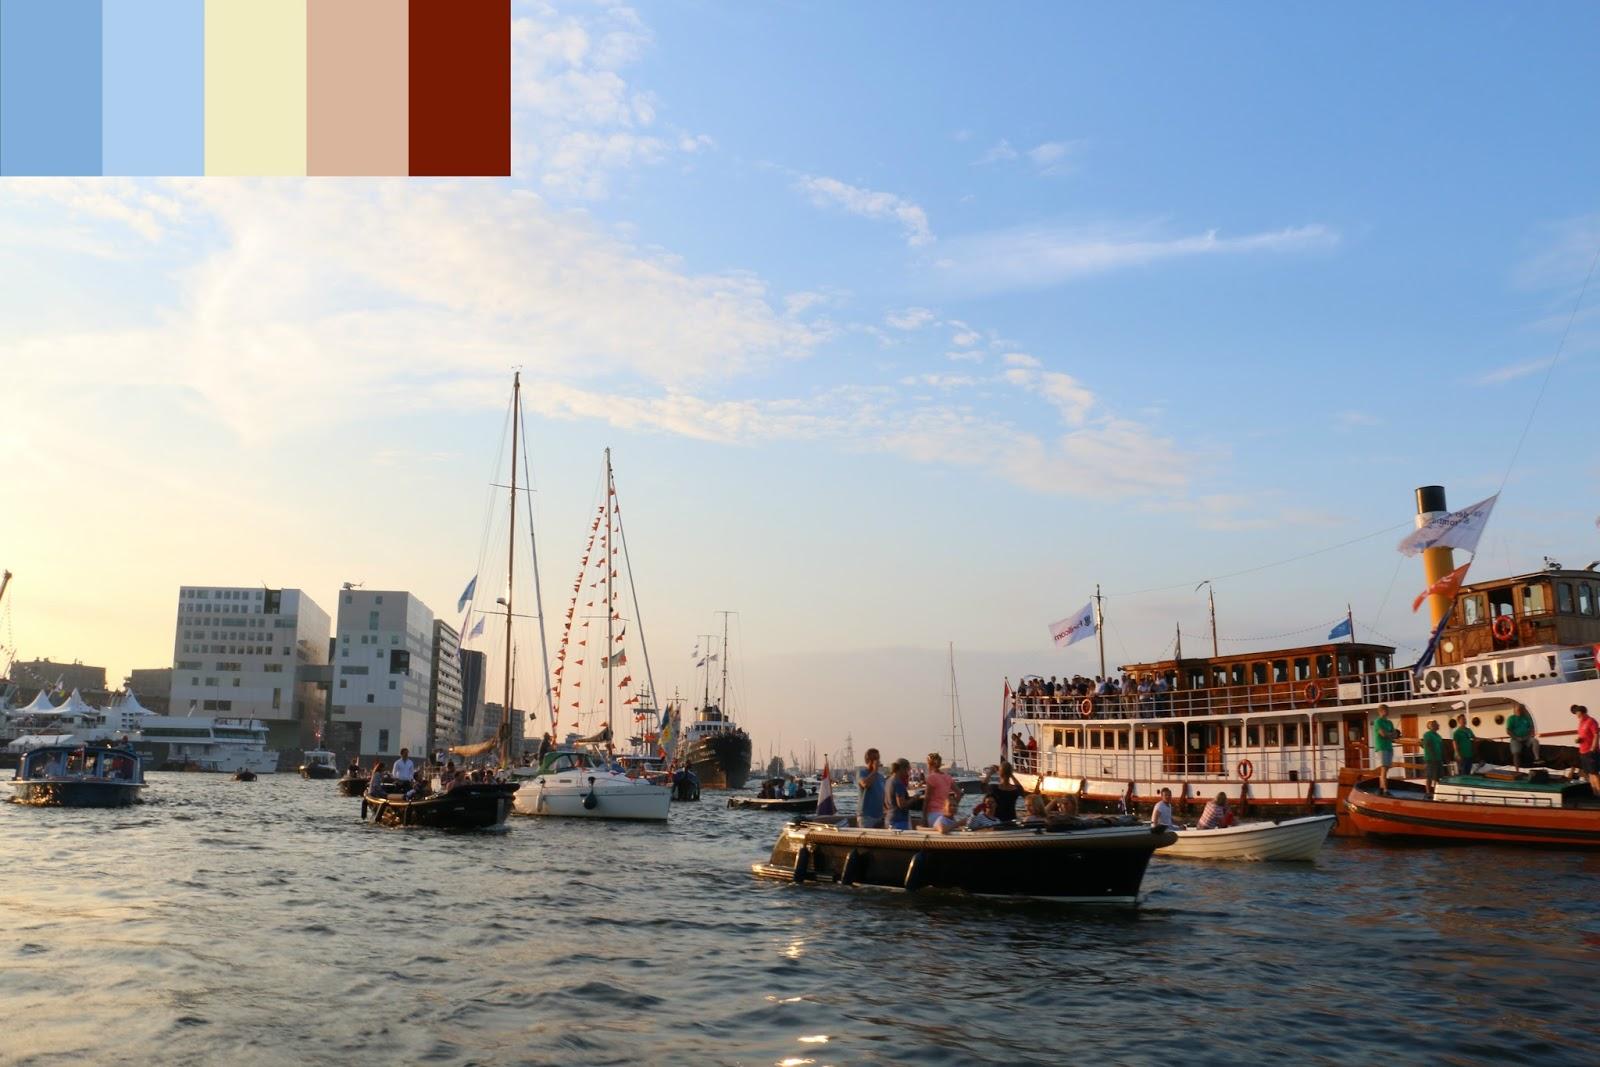 amsterdam, travel, amsterdam travel guide, travel guide